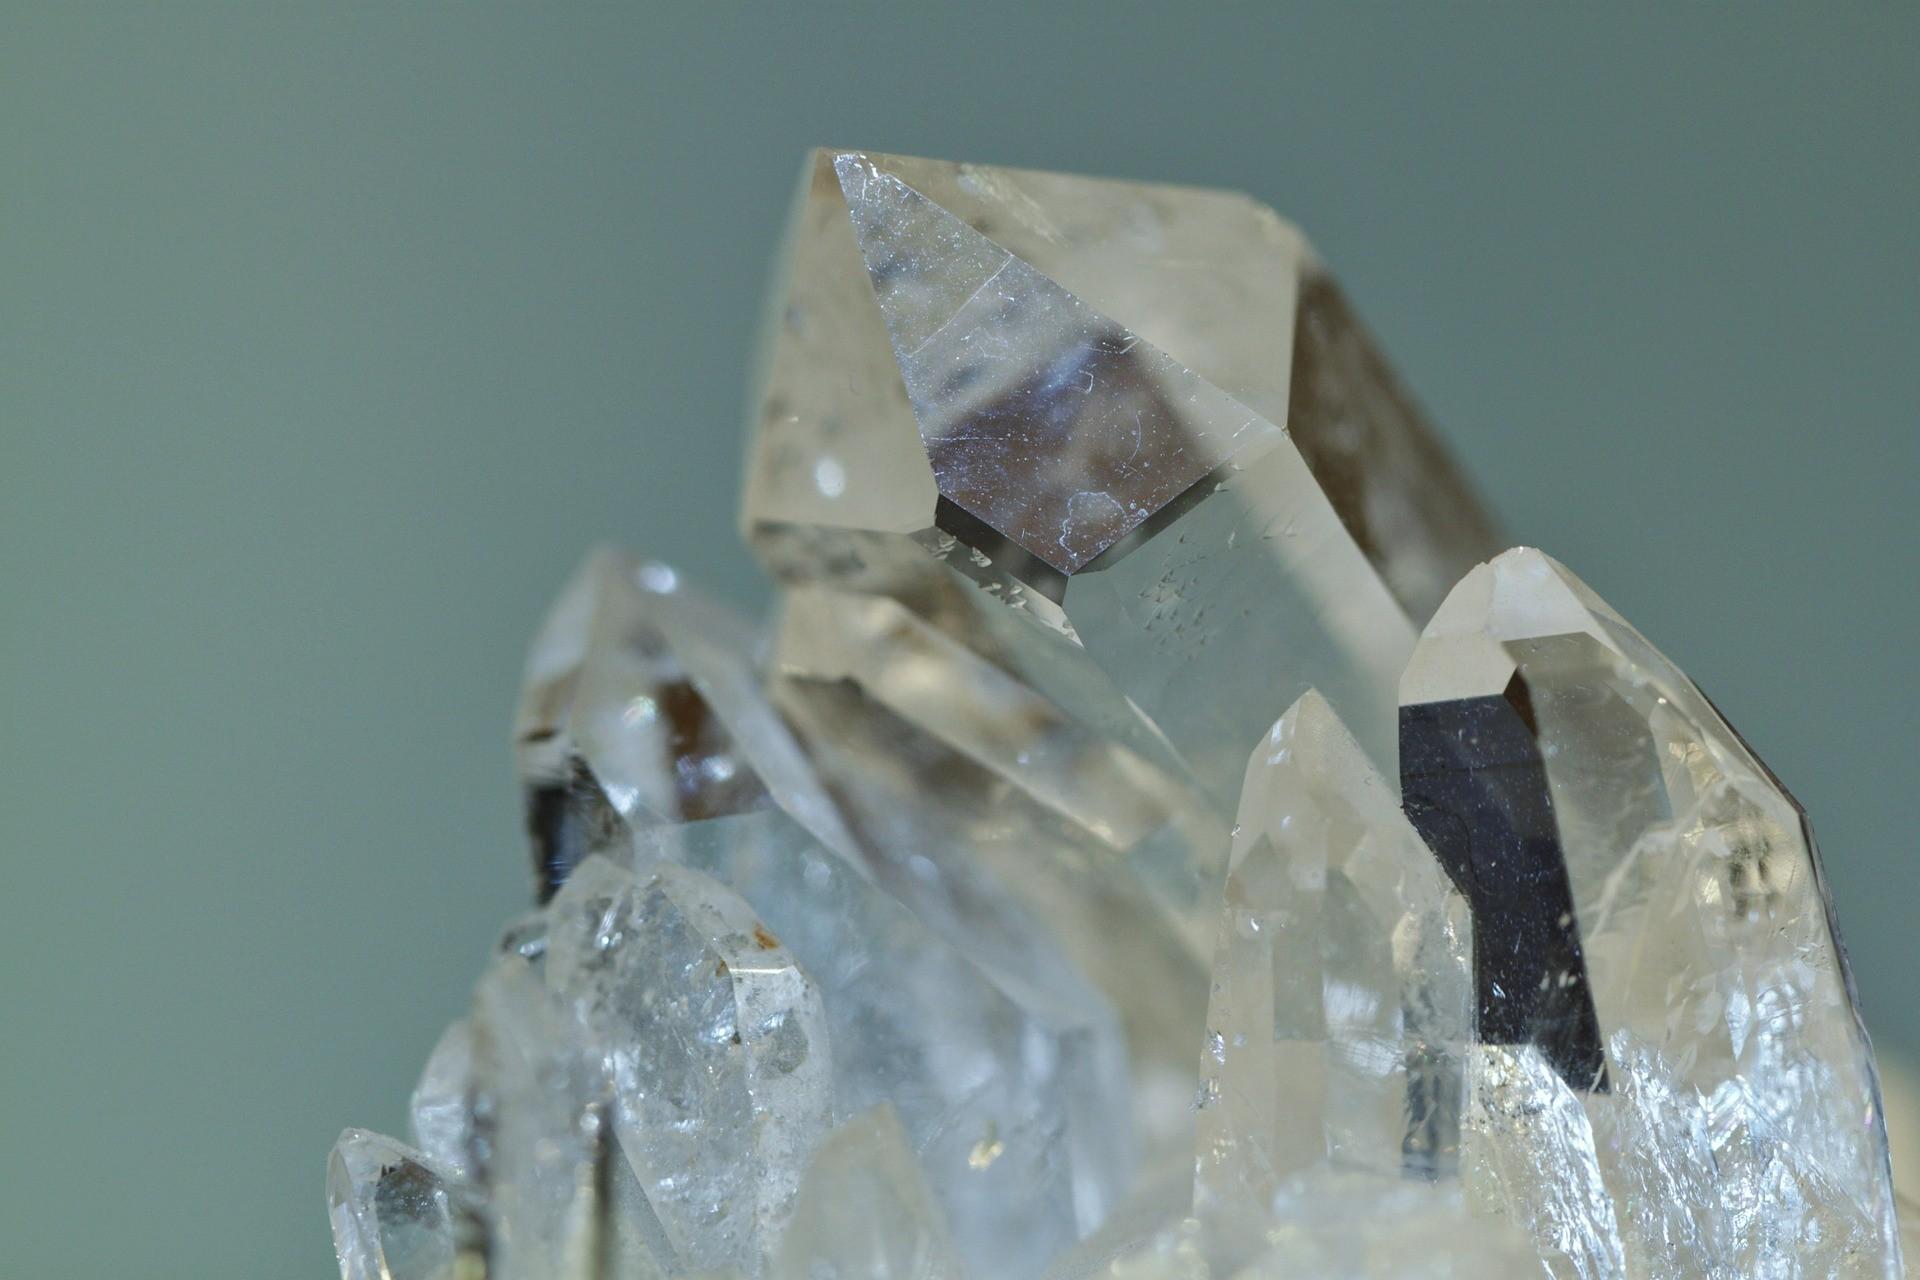 rock-crystal-397955_1920